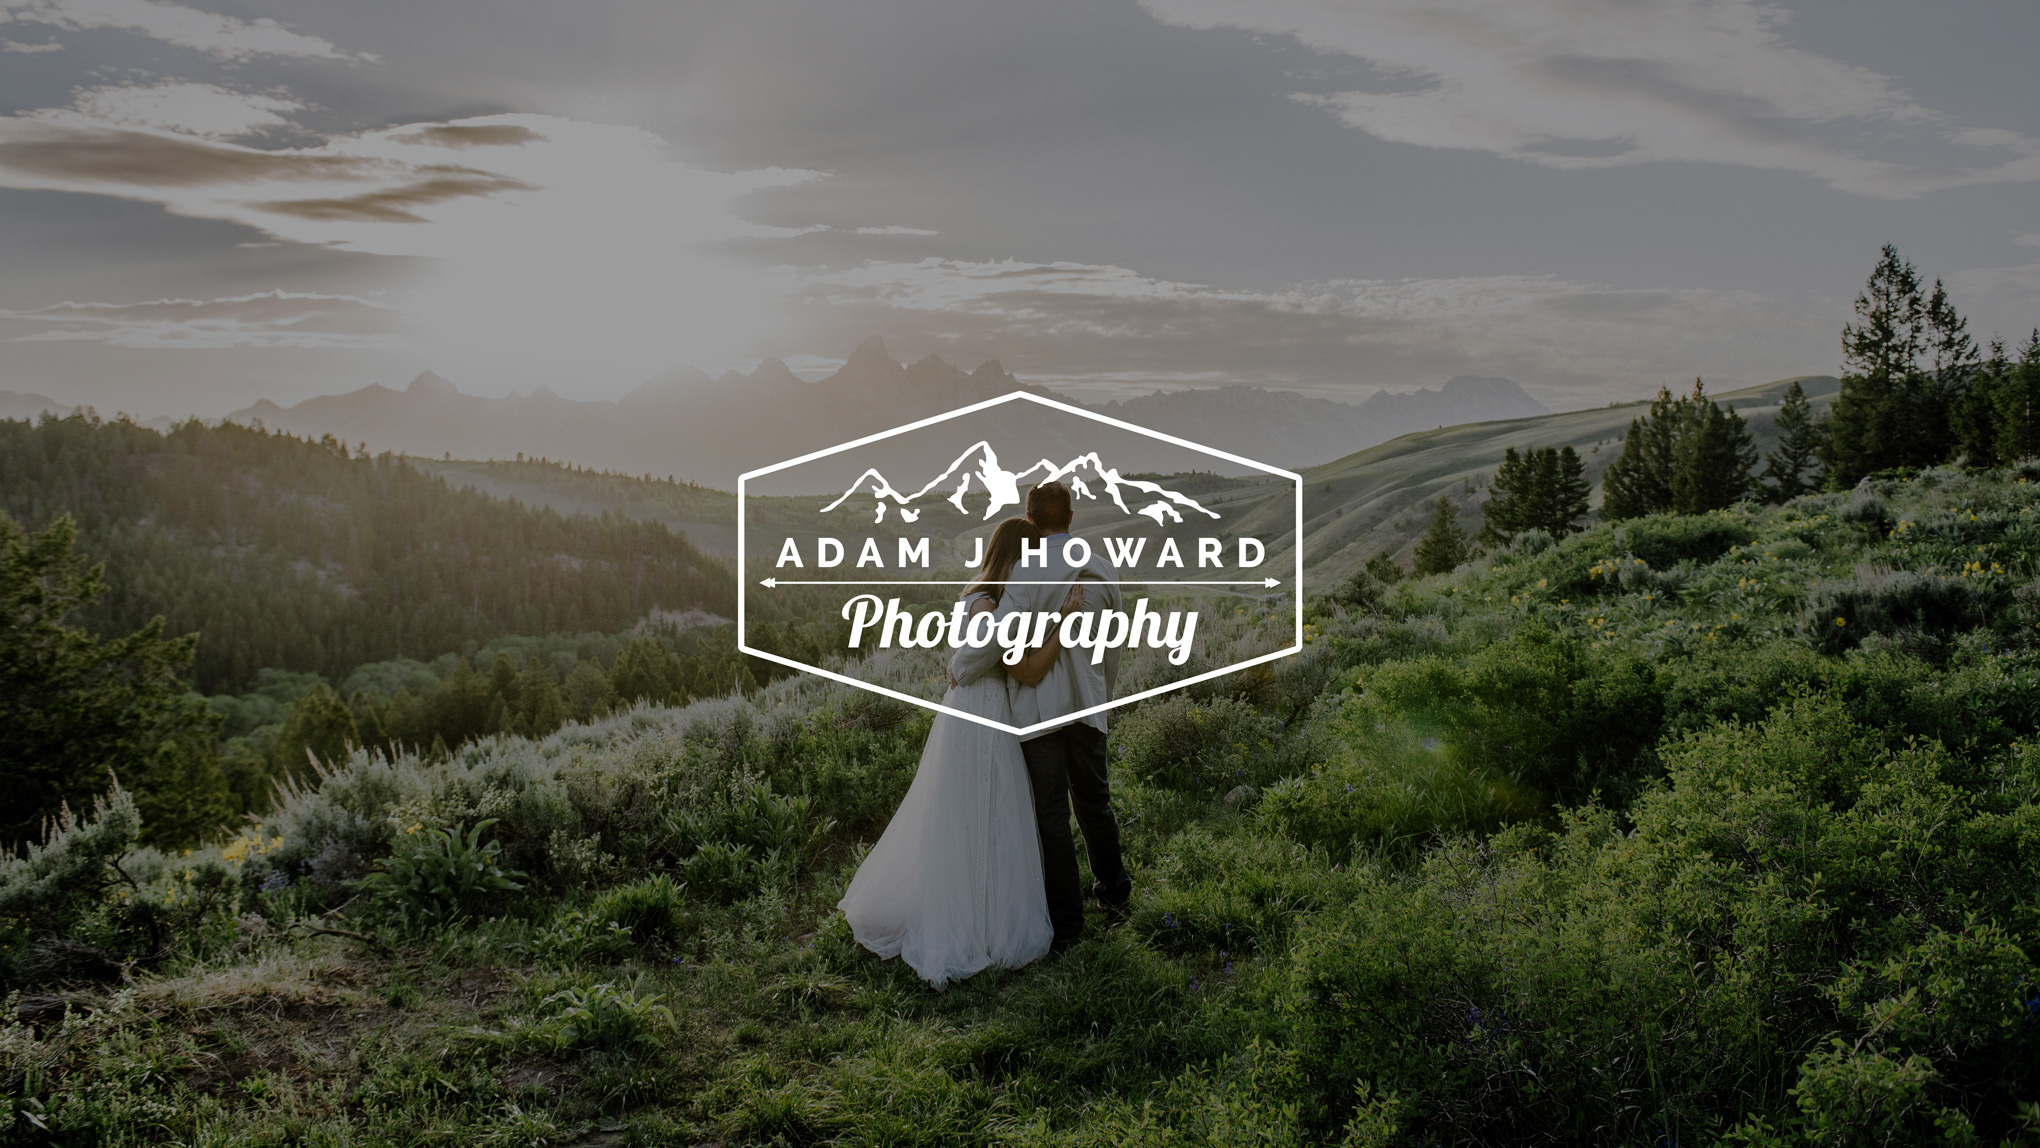 Wyoming's Top Rated Local® Photographers Award Winner: Adam J. Howard Photography